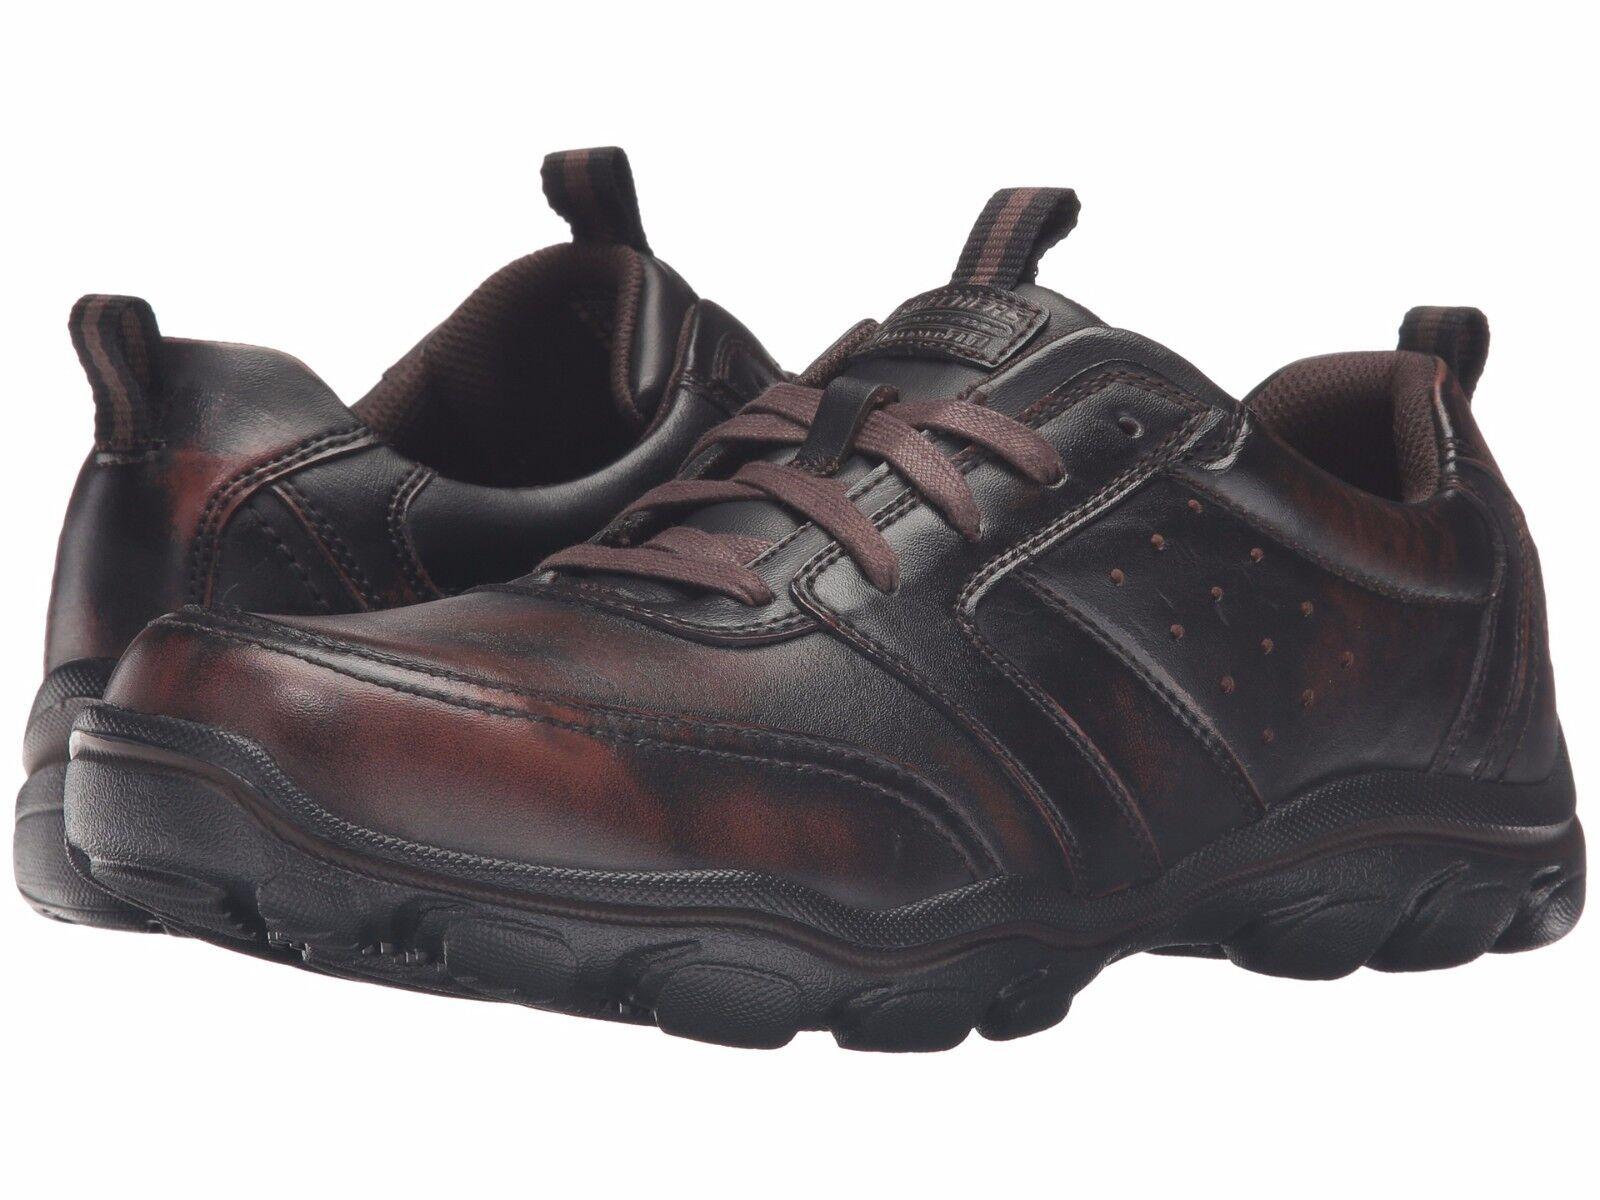 Uomo Skechers Montz - - - Brex Comfort scarpe, 64899  DKBR Dimensiones 8-14 Dark Marrone 945718